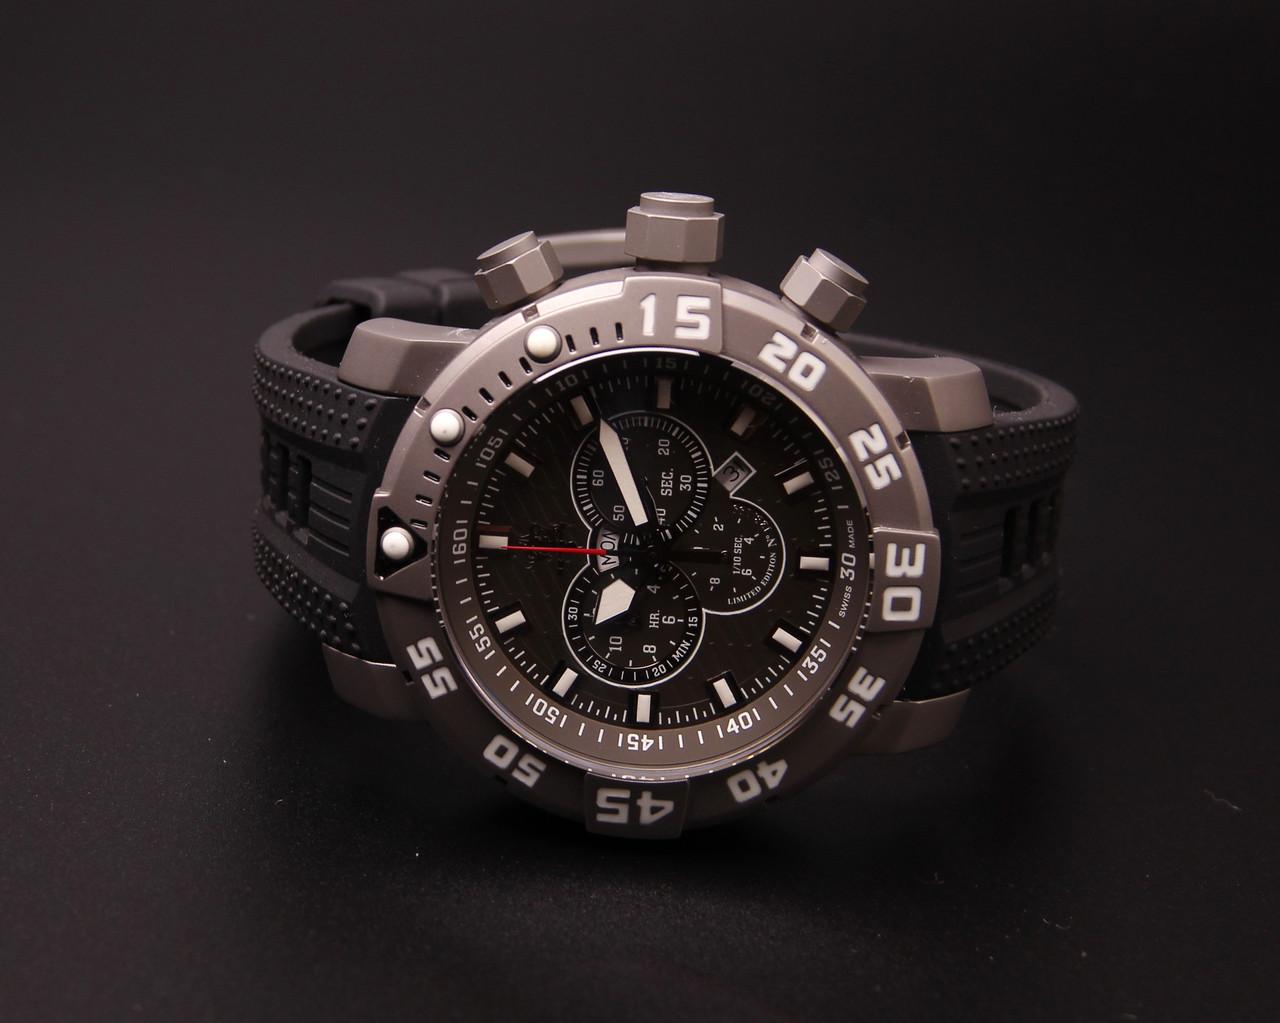 Мужские часы Invicta 14280 Sea Base Limited Edition